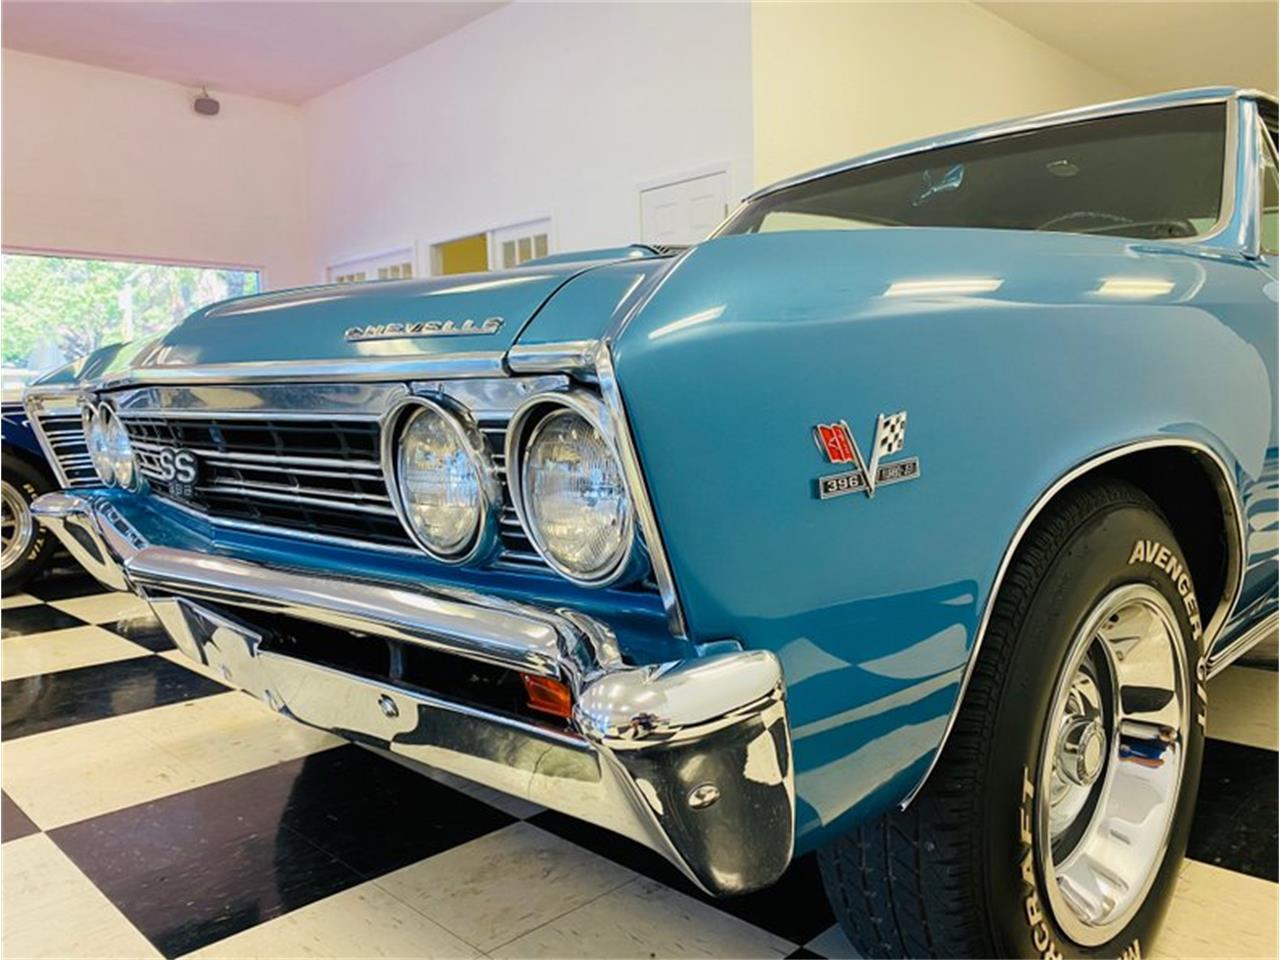 1967 Chevrolet Chevelle (CC-1358123) for sale in Largo, Florida